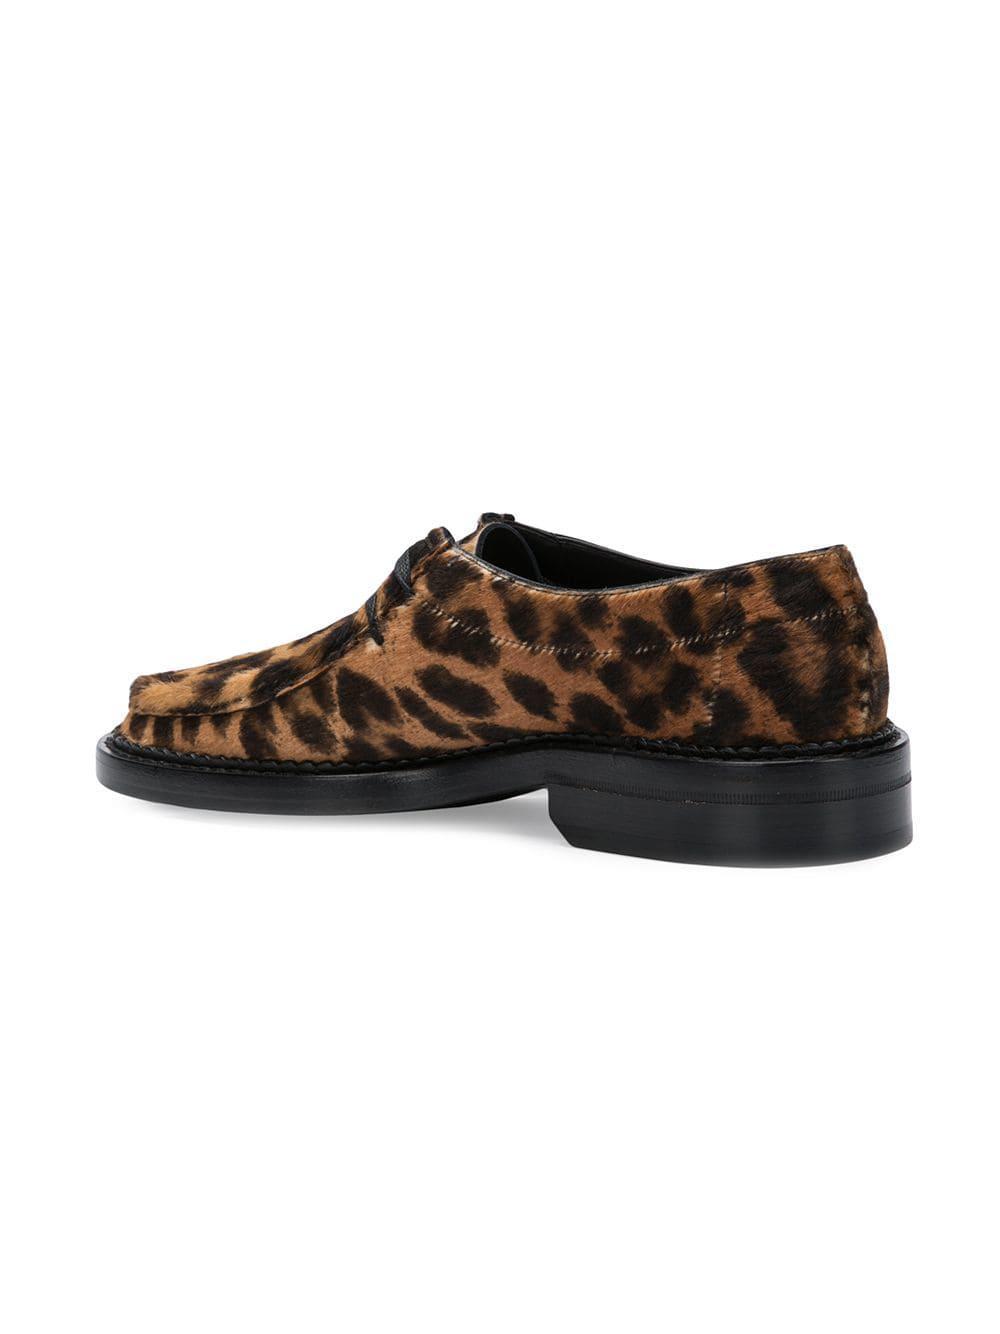 425d4afe273 Saint Laurent Leopard Print Loafers in Brown for Men - Lyst